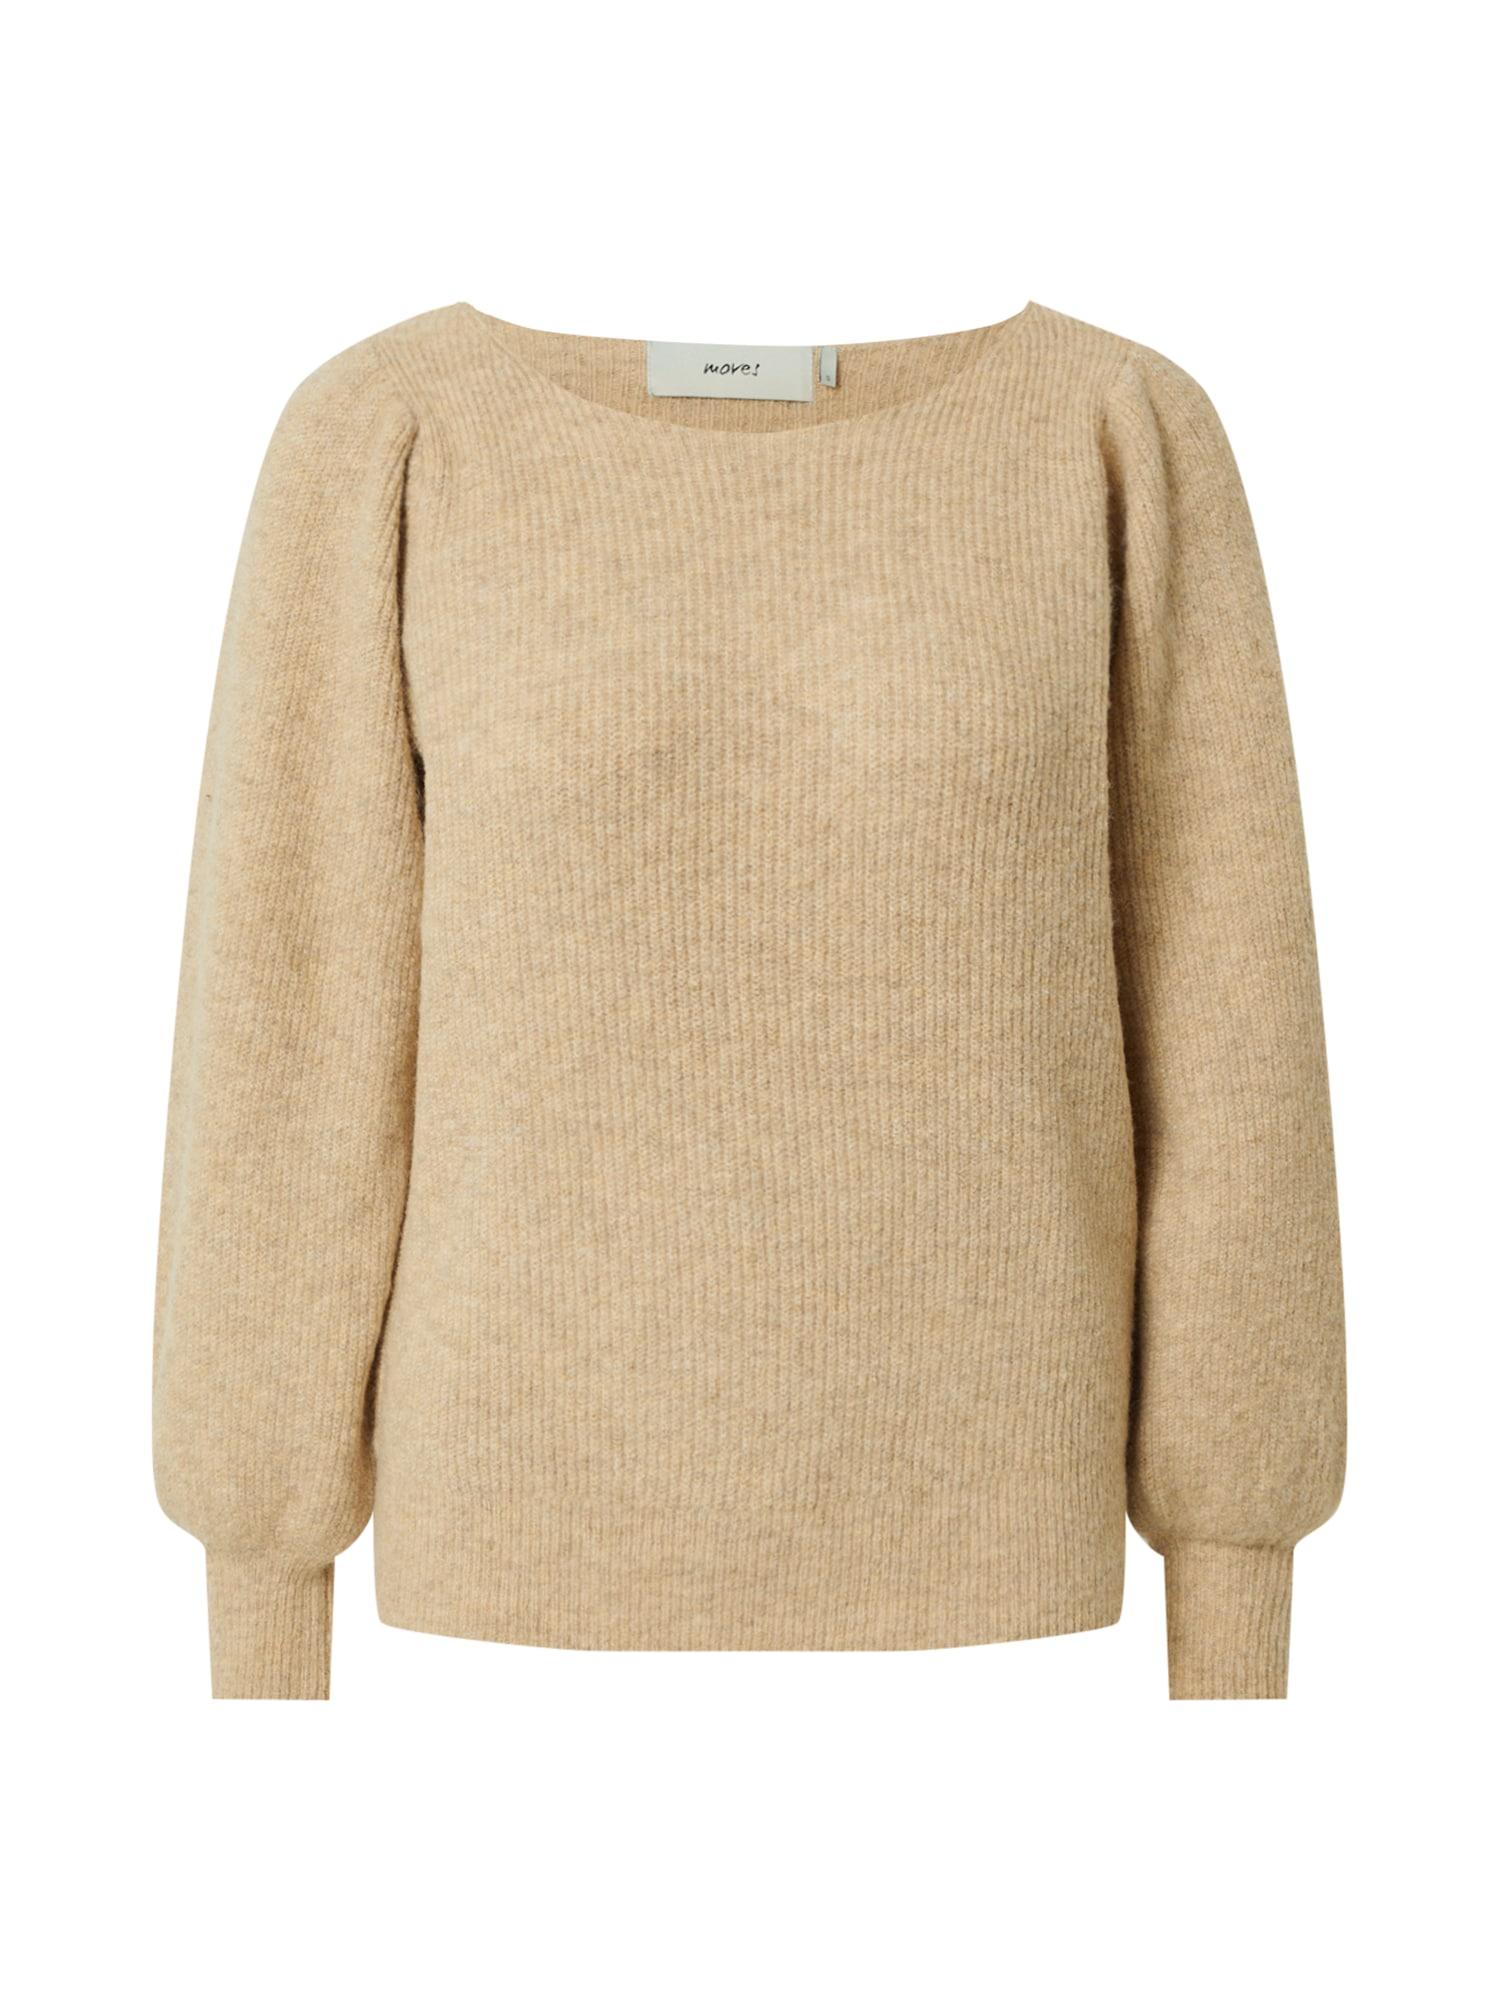 Moves Megztinis gelsvai pilka spalva